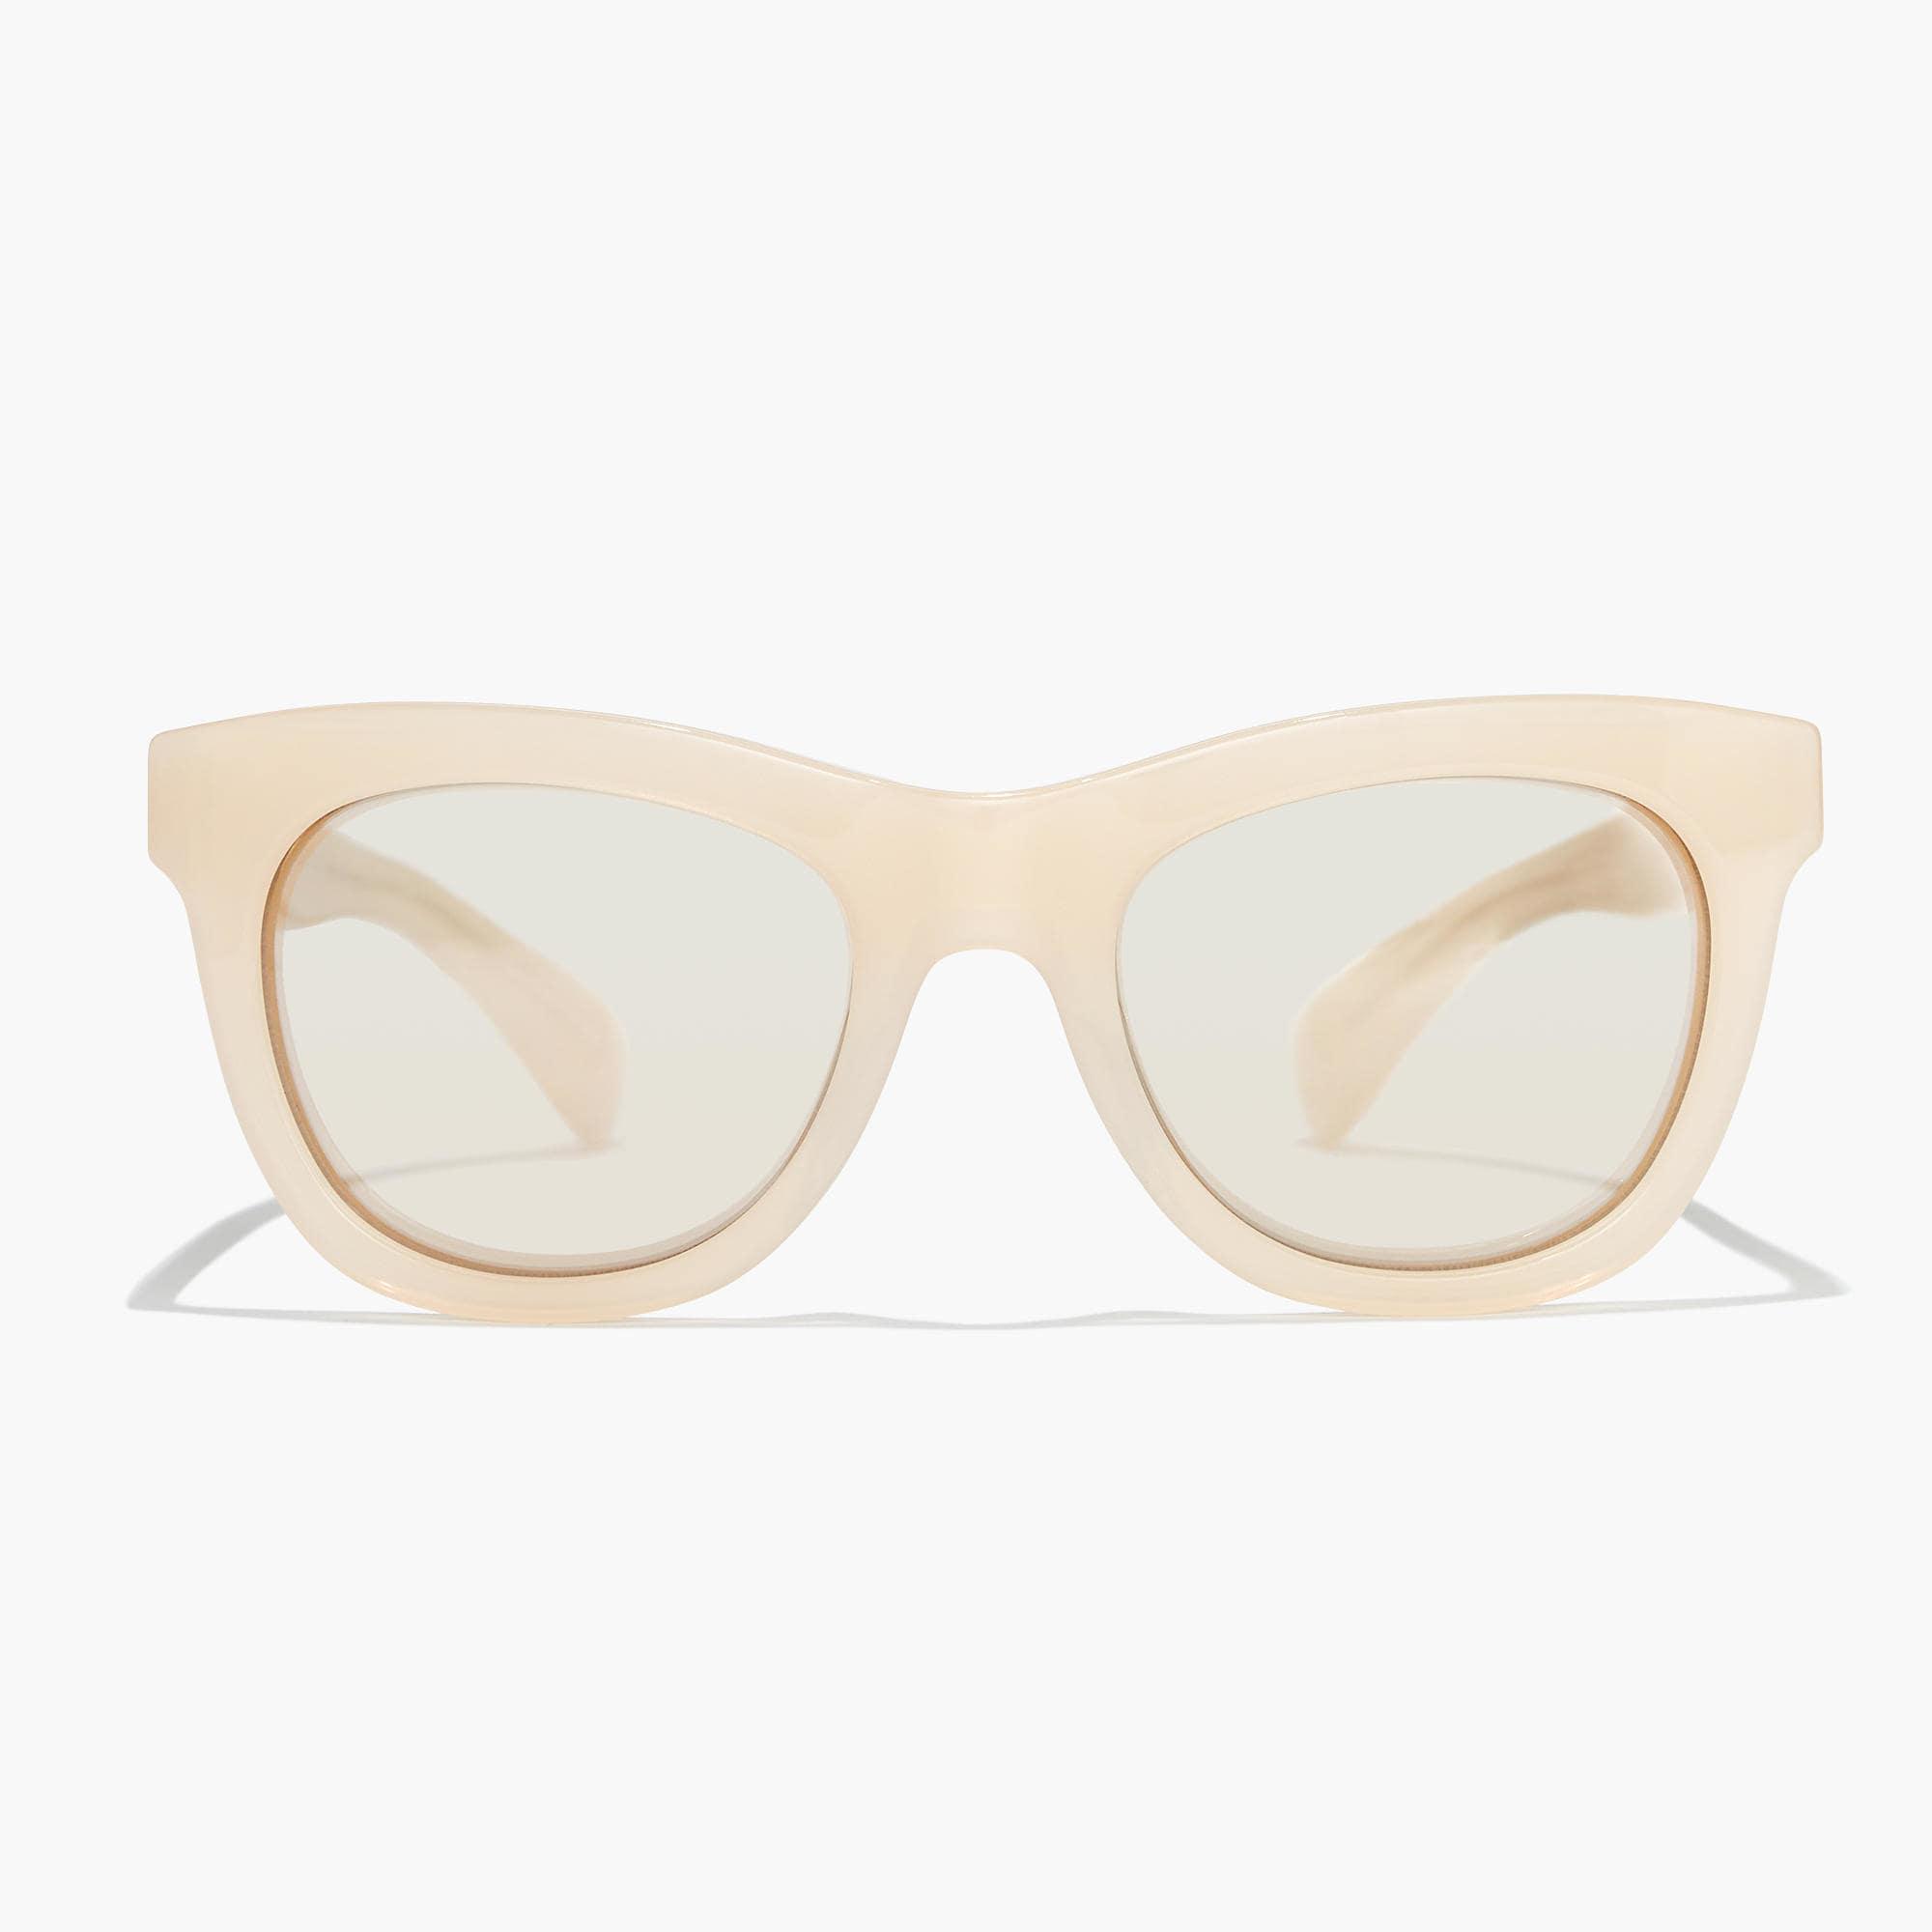 390271a109 Lyst - J.Crew Betty Sunglasses